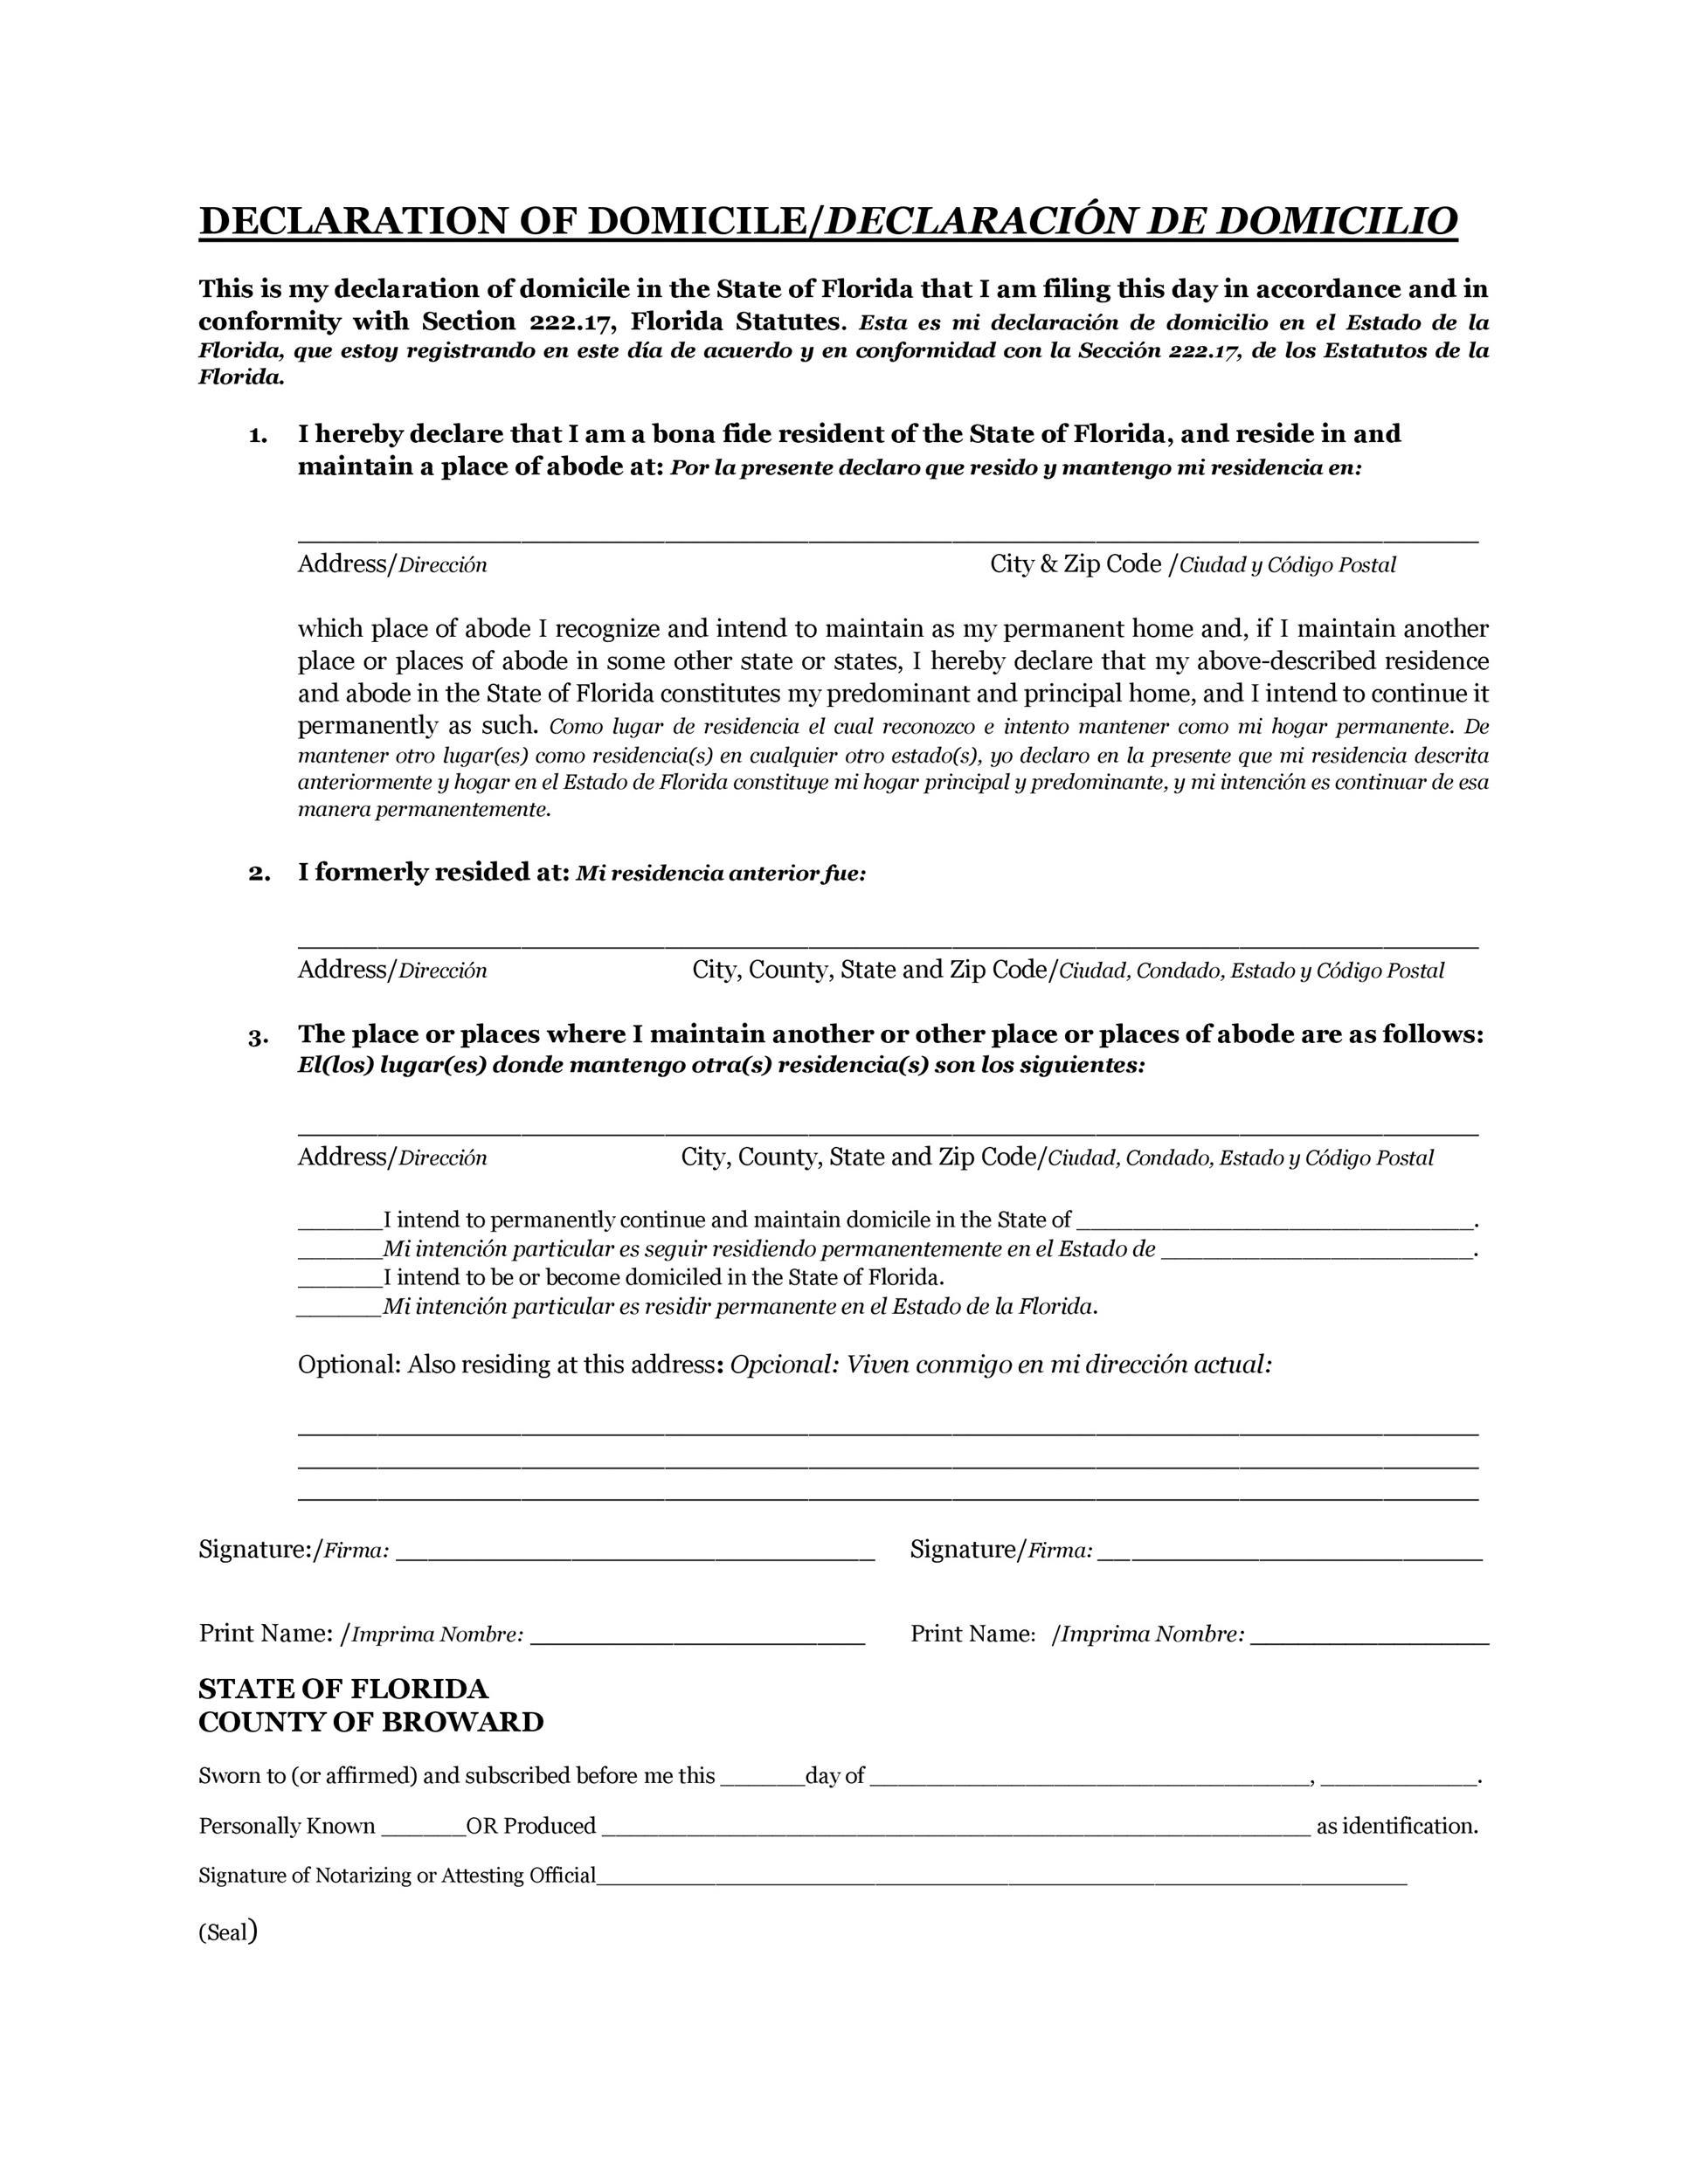 Free affidavit of domicile 45